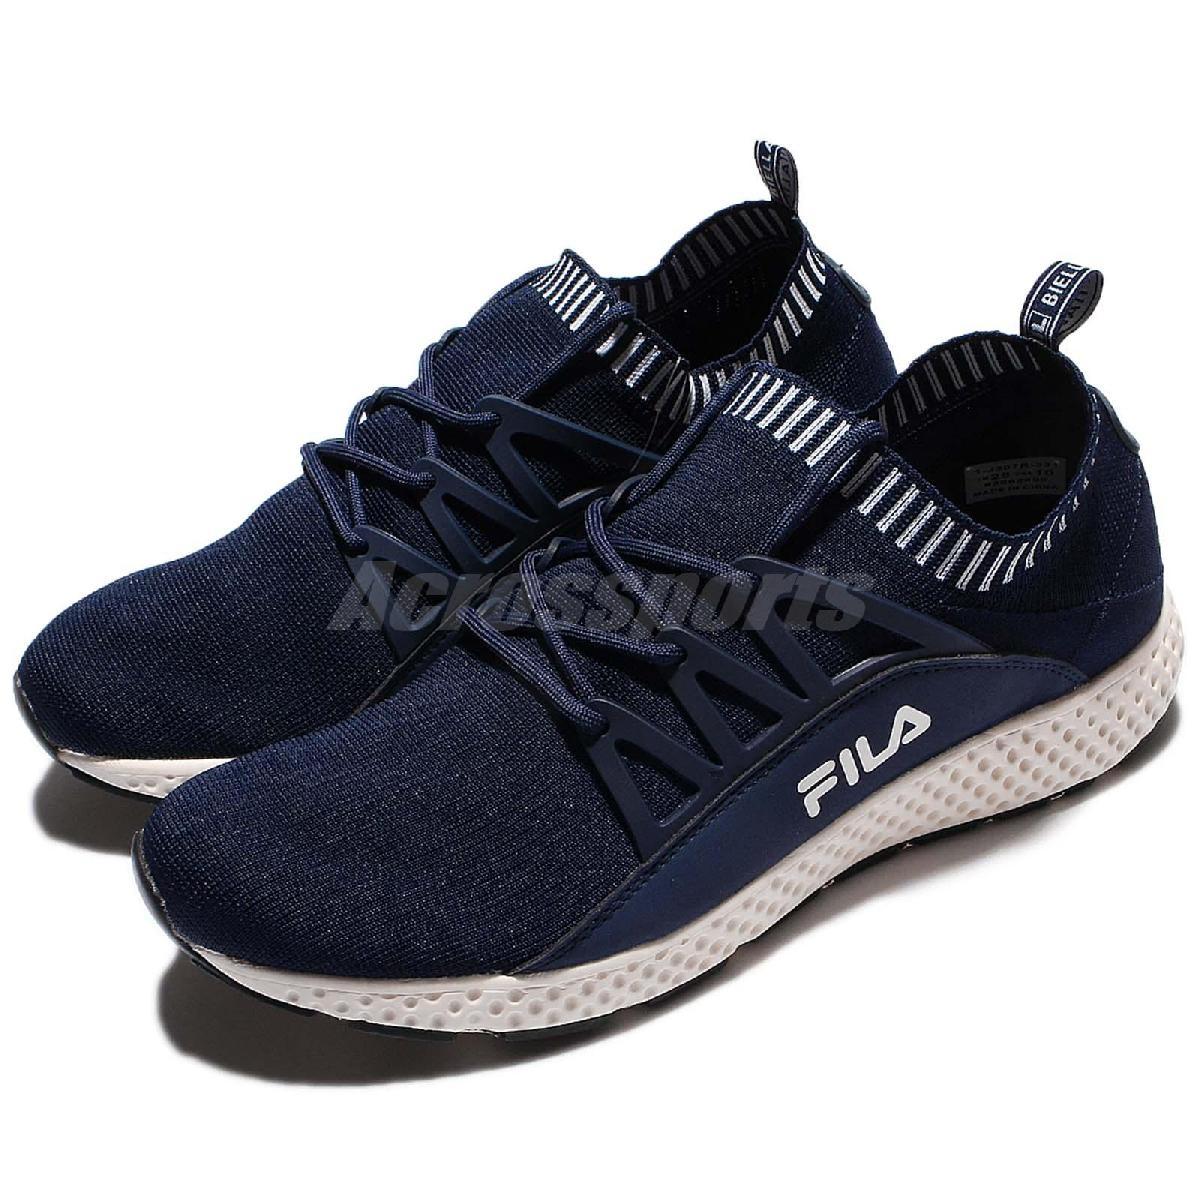 FILA 慢跑鞋 J307R 低筒 襪套式 藍 白 復古奶油底 運動鞋 編織鞋面 男鞋【PUMP306】 1J307R331